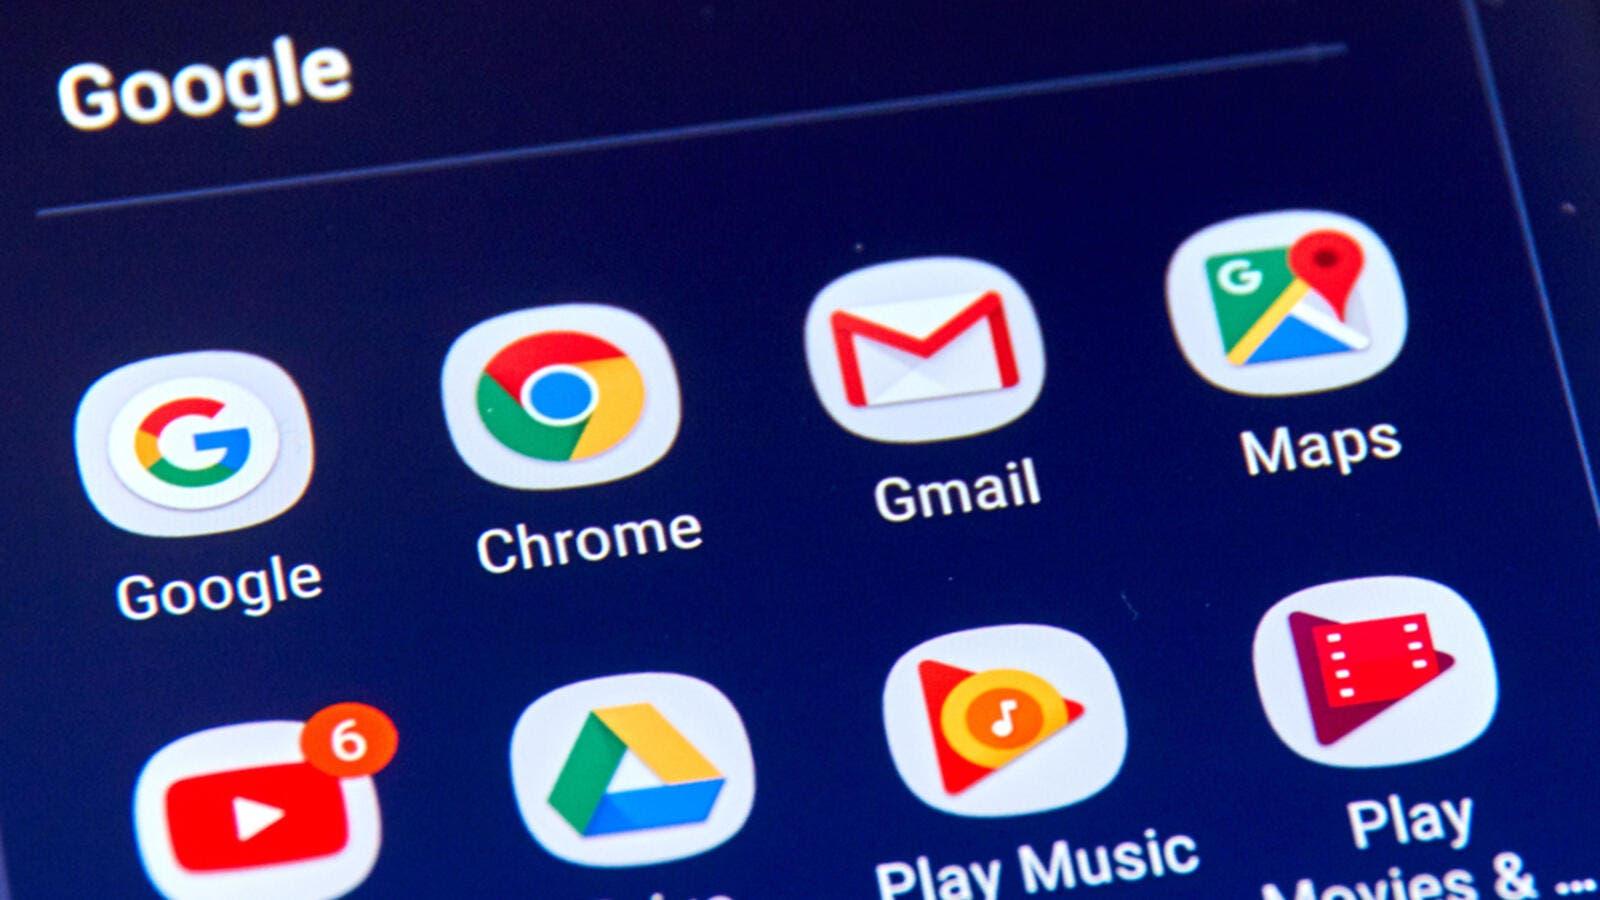 Gmail, Google Drive Stop in World Causing Panic | Al Bawaba on